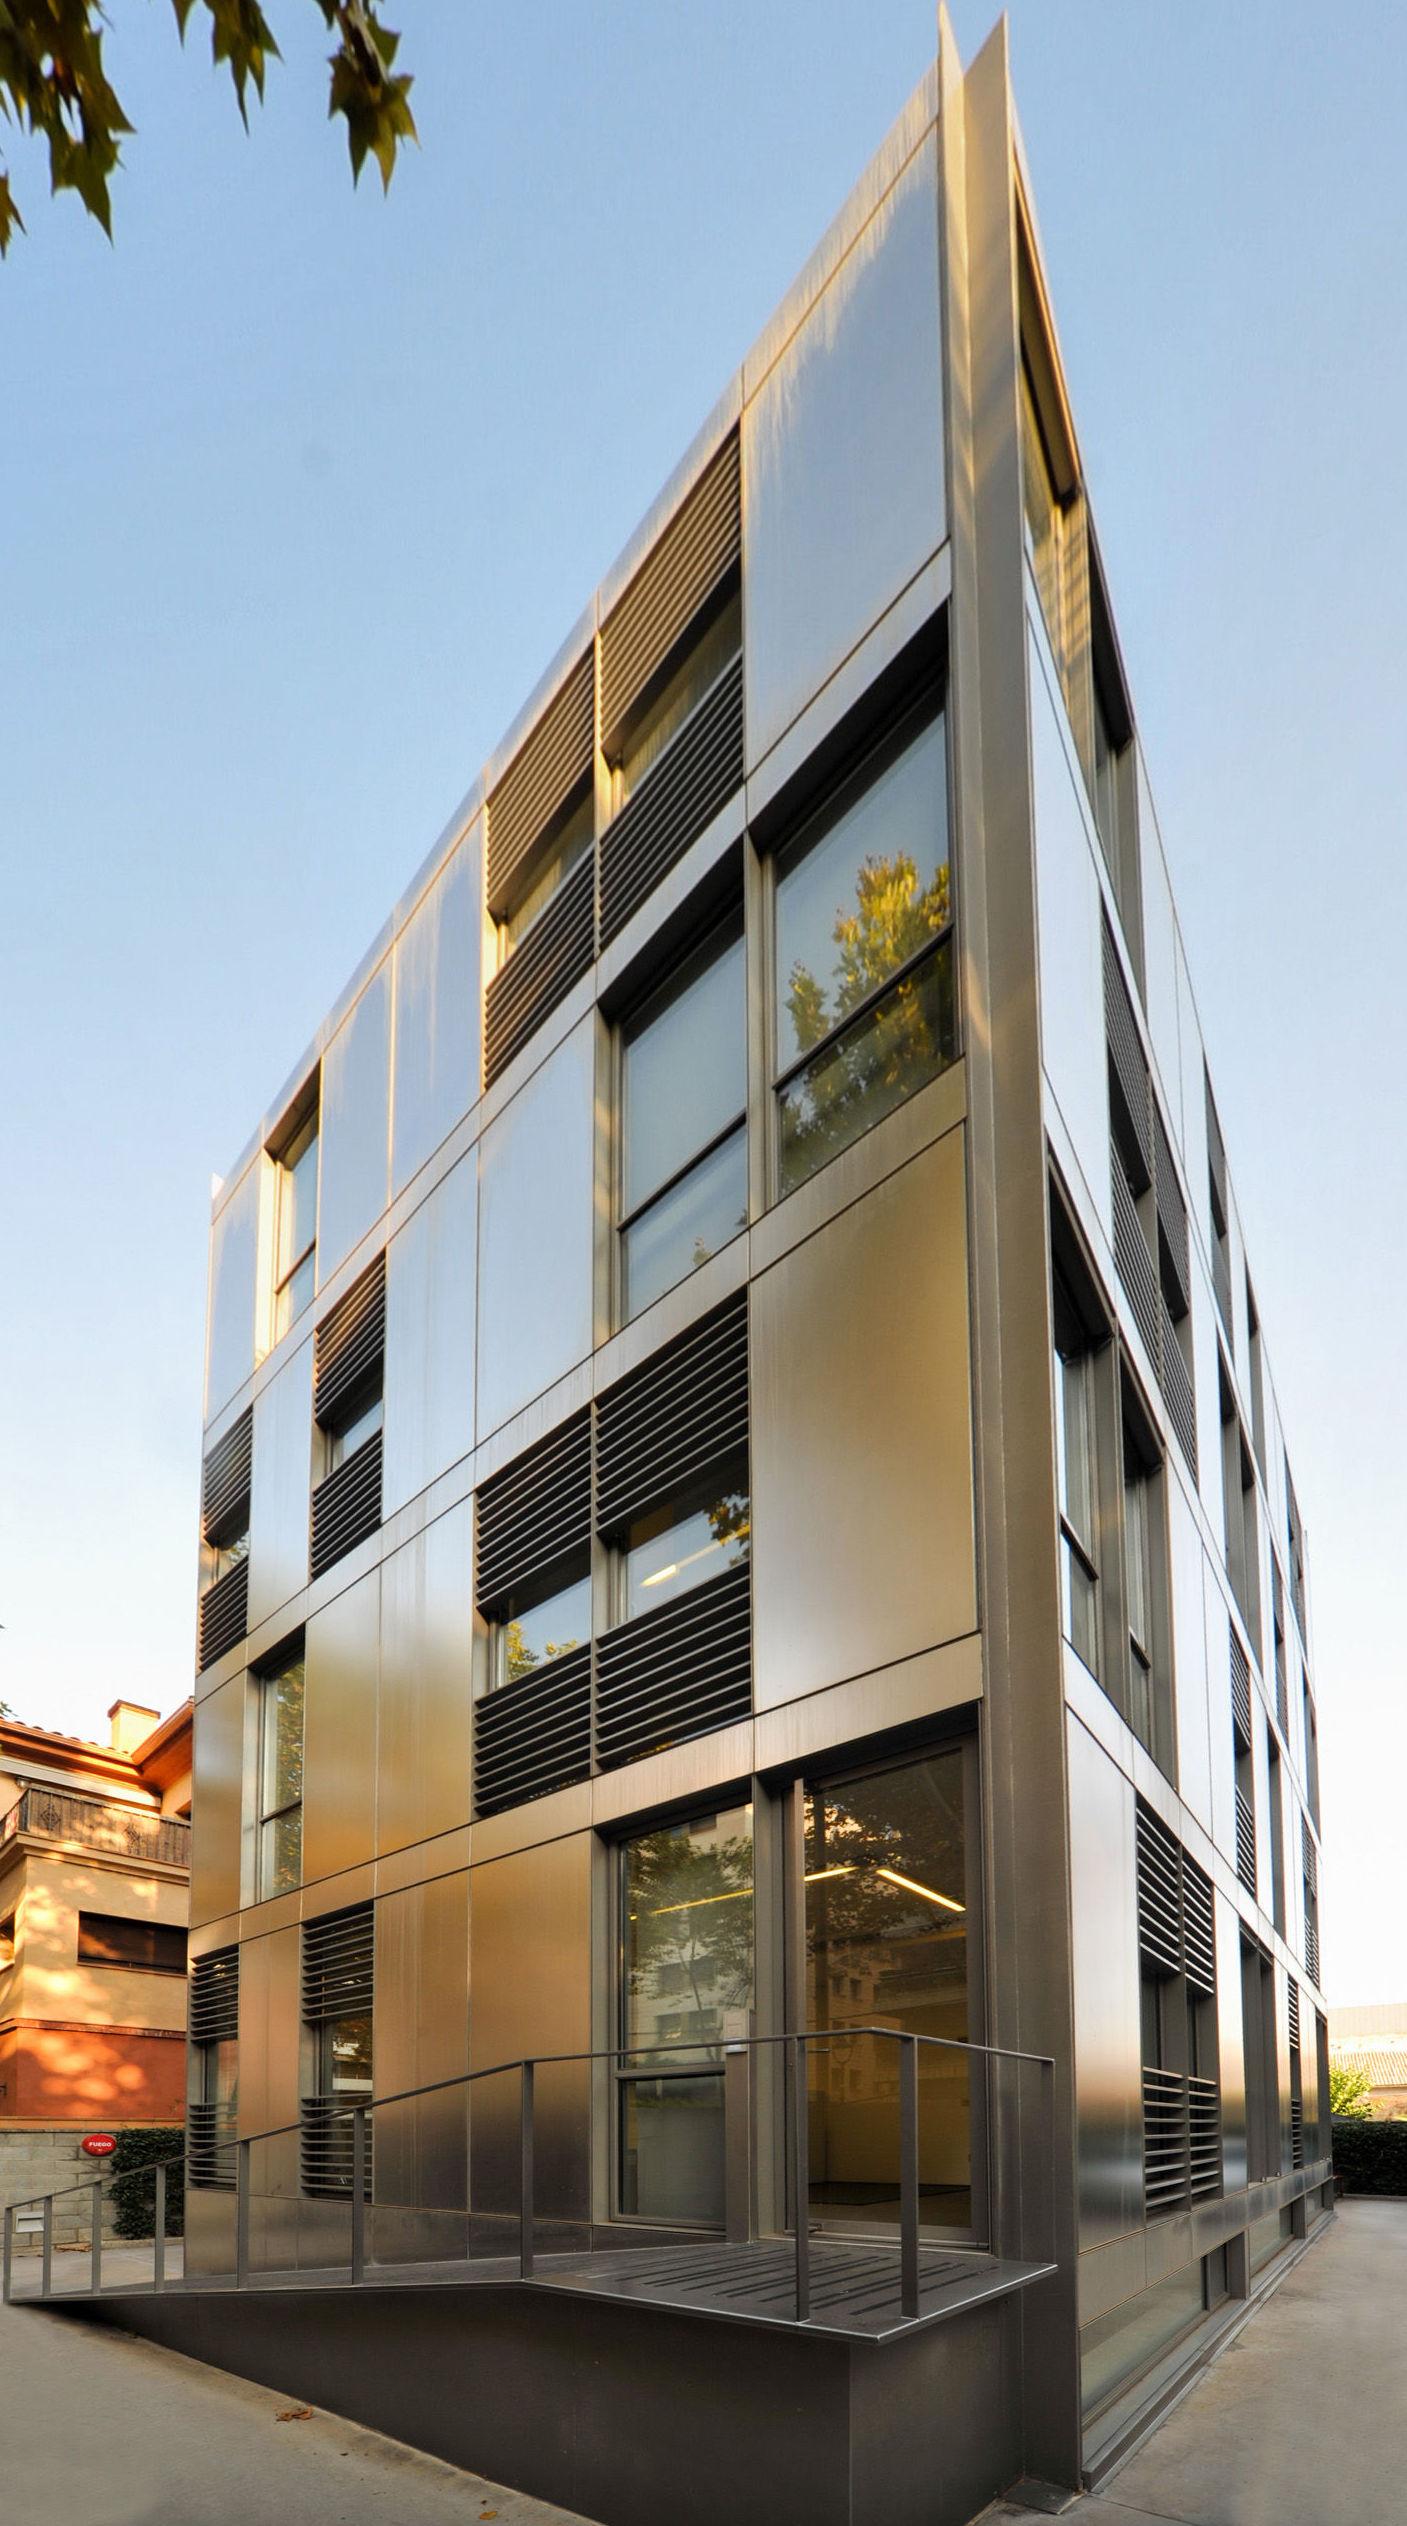 Foto 3 de Centros de estética en Barcelona   Serena Clinic